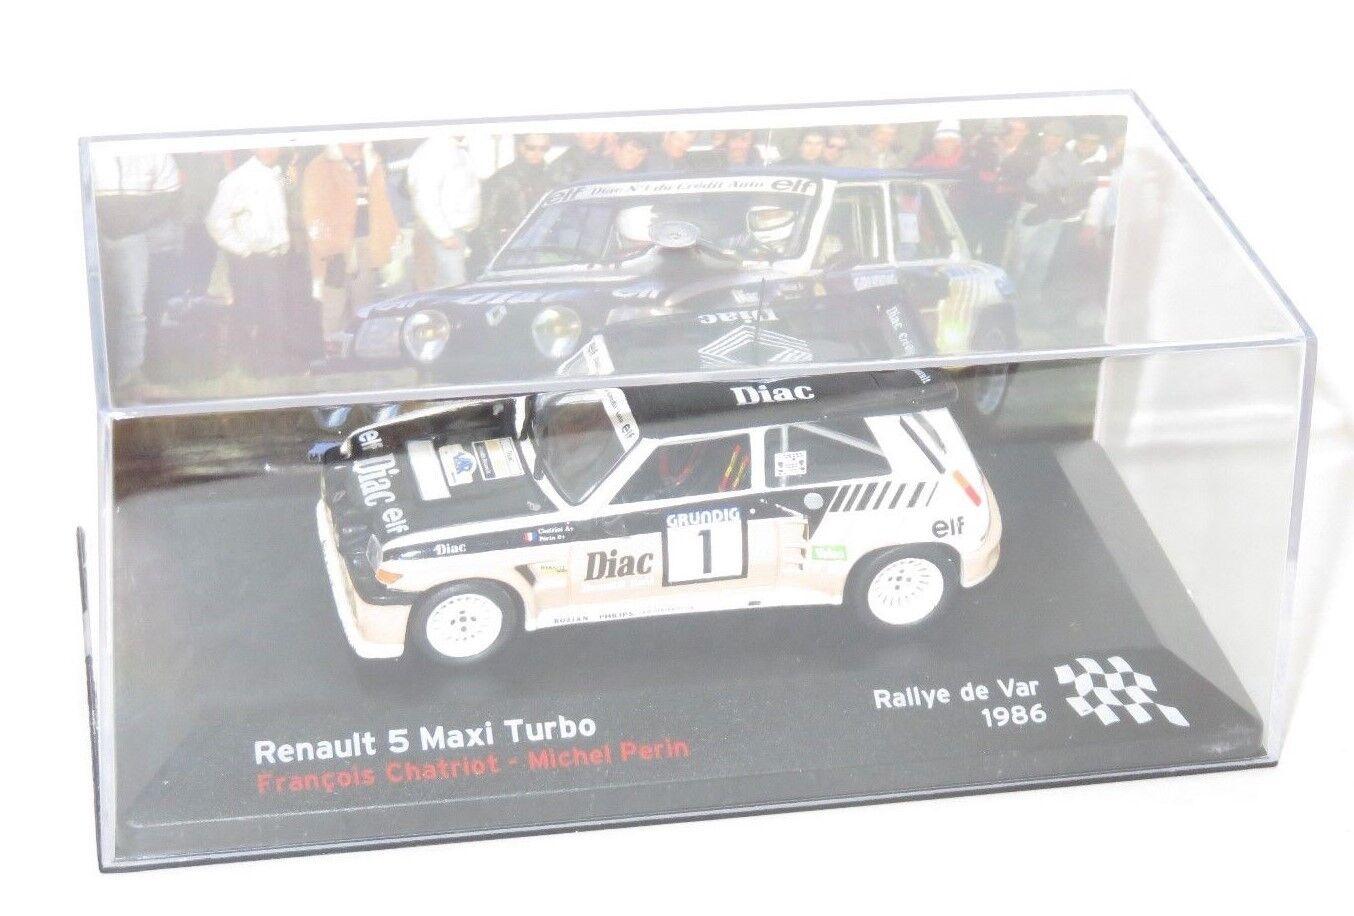 1 43 Renault 5 Maxi Turbo Diac Rallye de Var 1986 F. Chatriot M. Perin